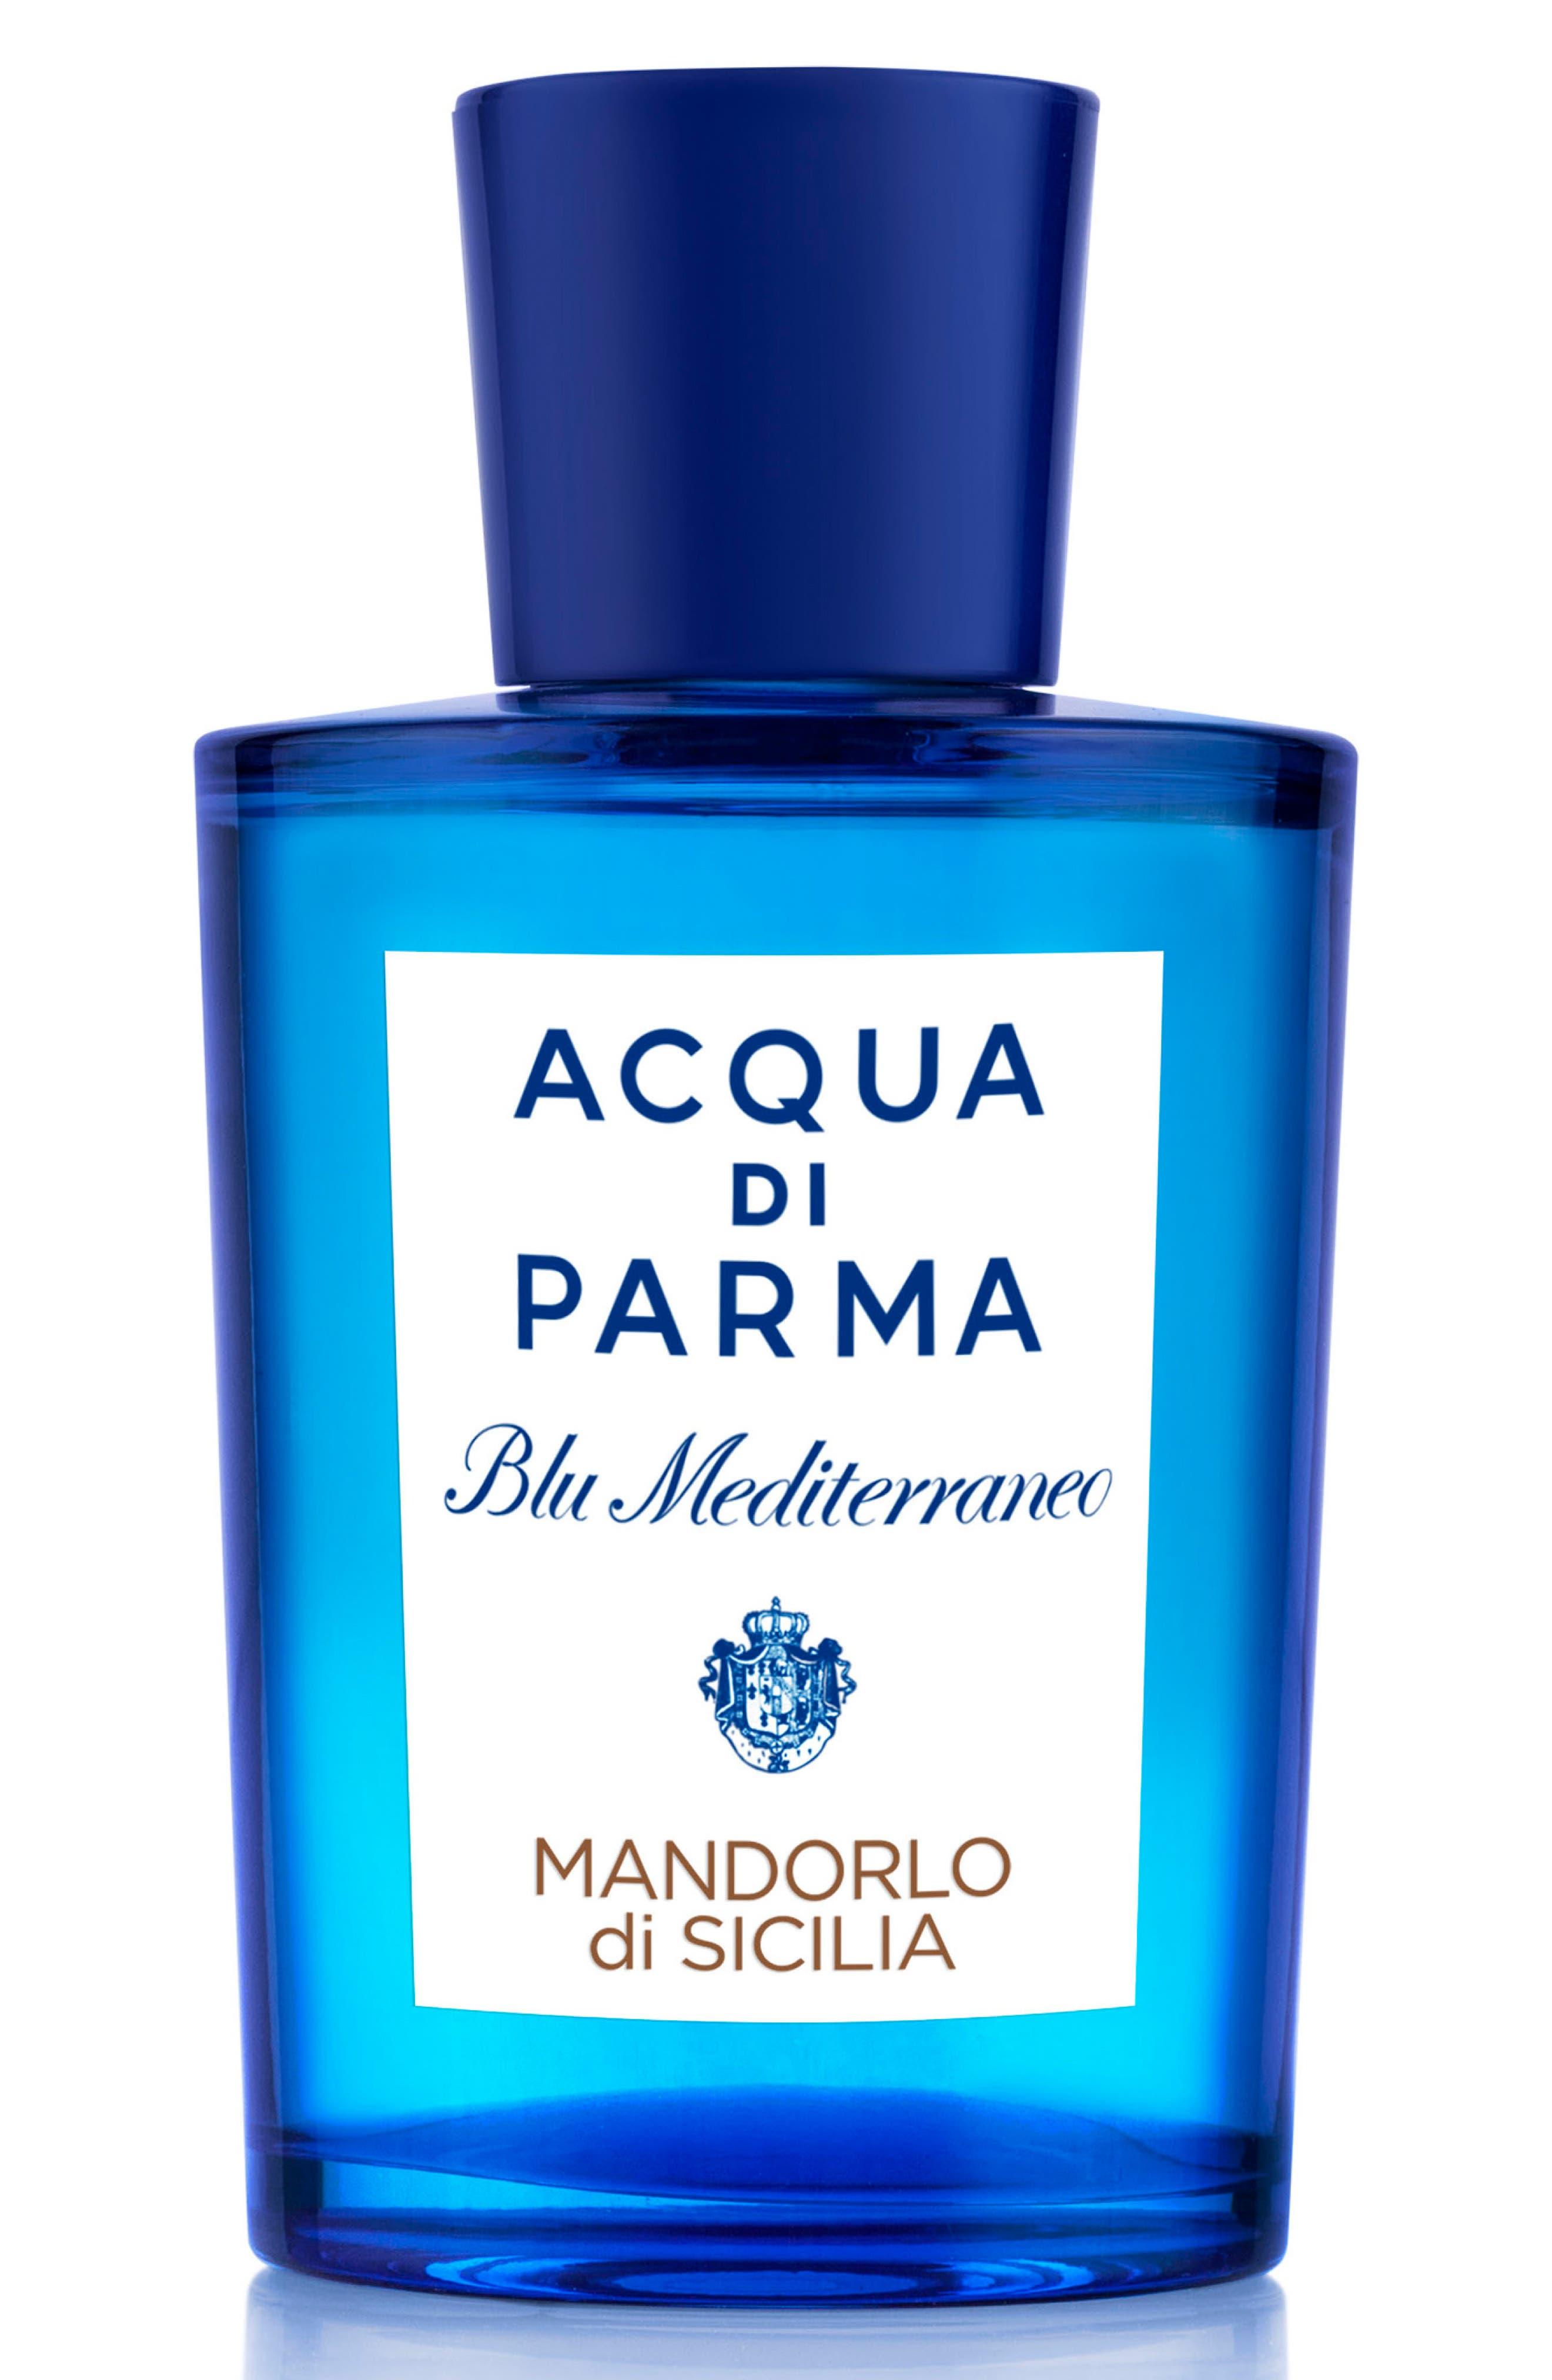 'Blu Mediterraneo' Mandorlo Di Sicilia Eau De Toilette Spray